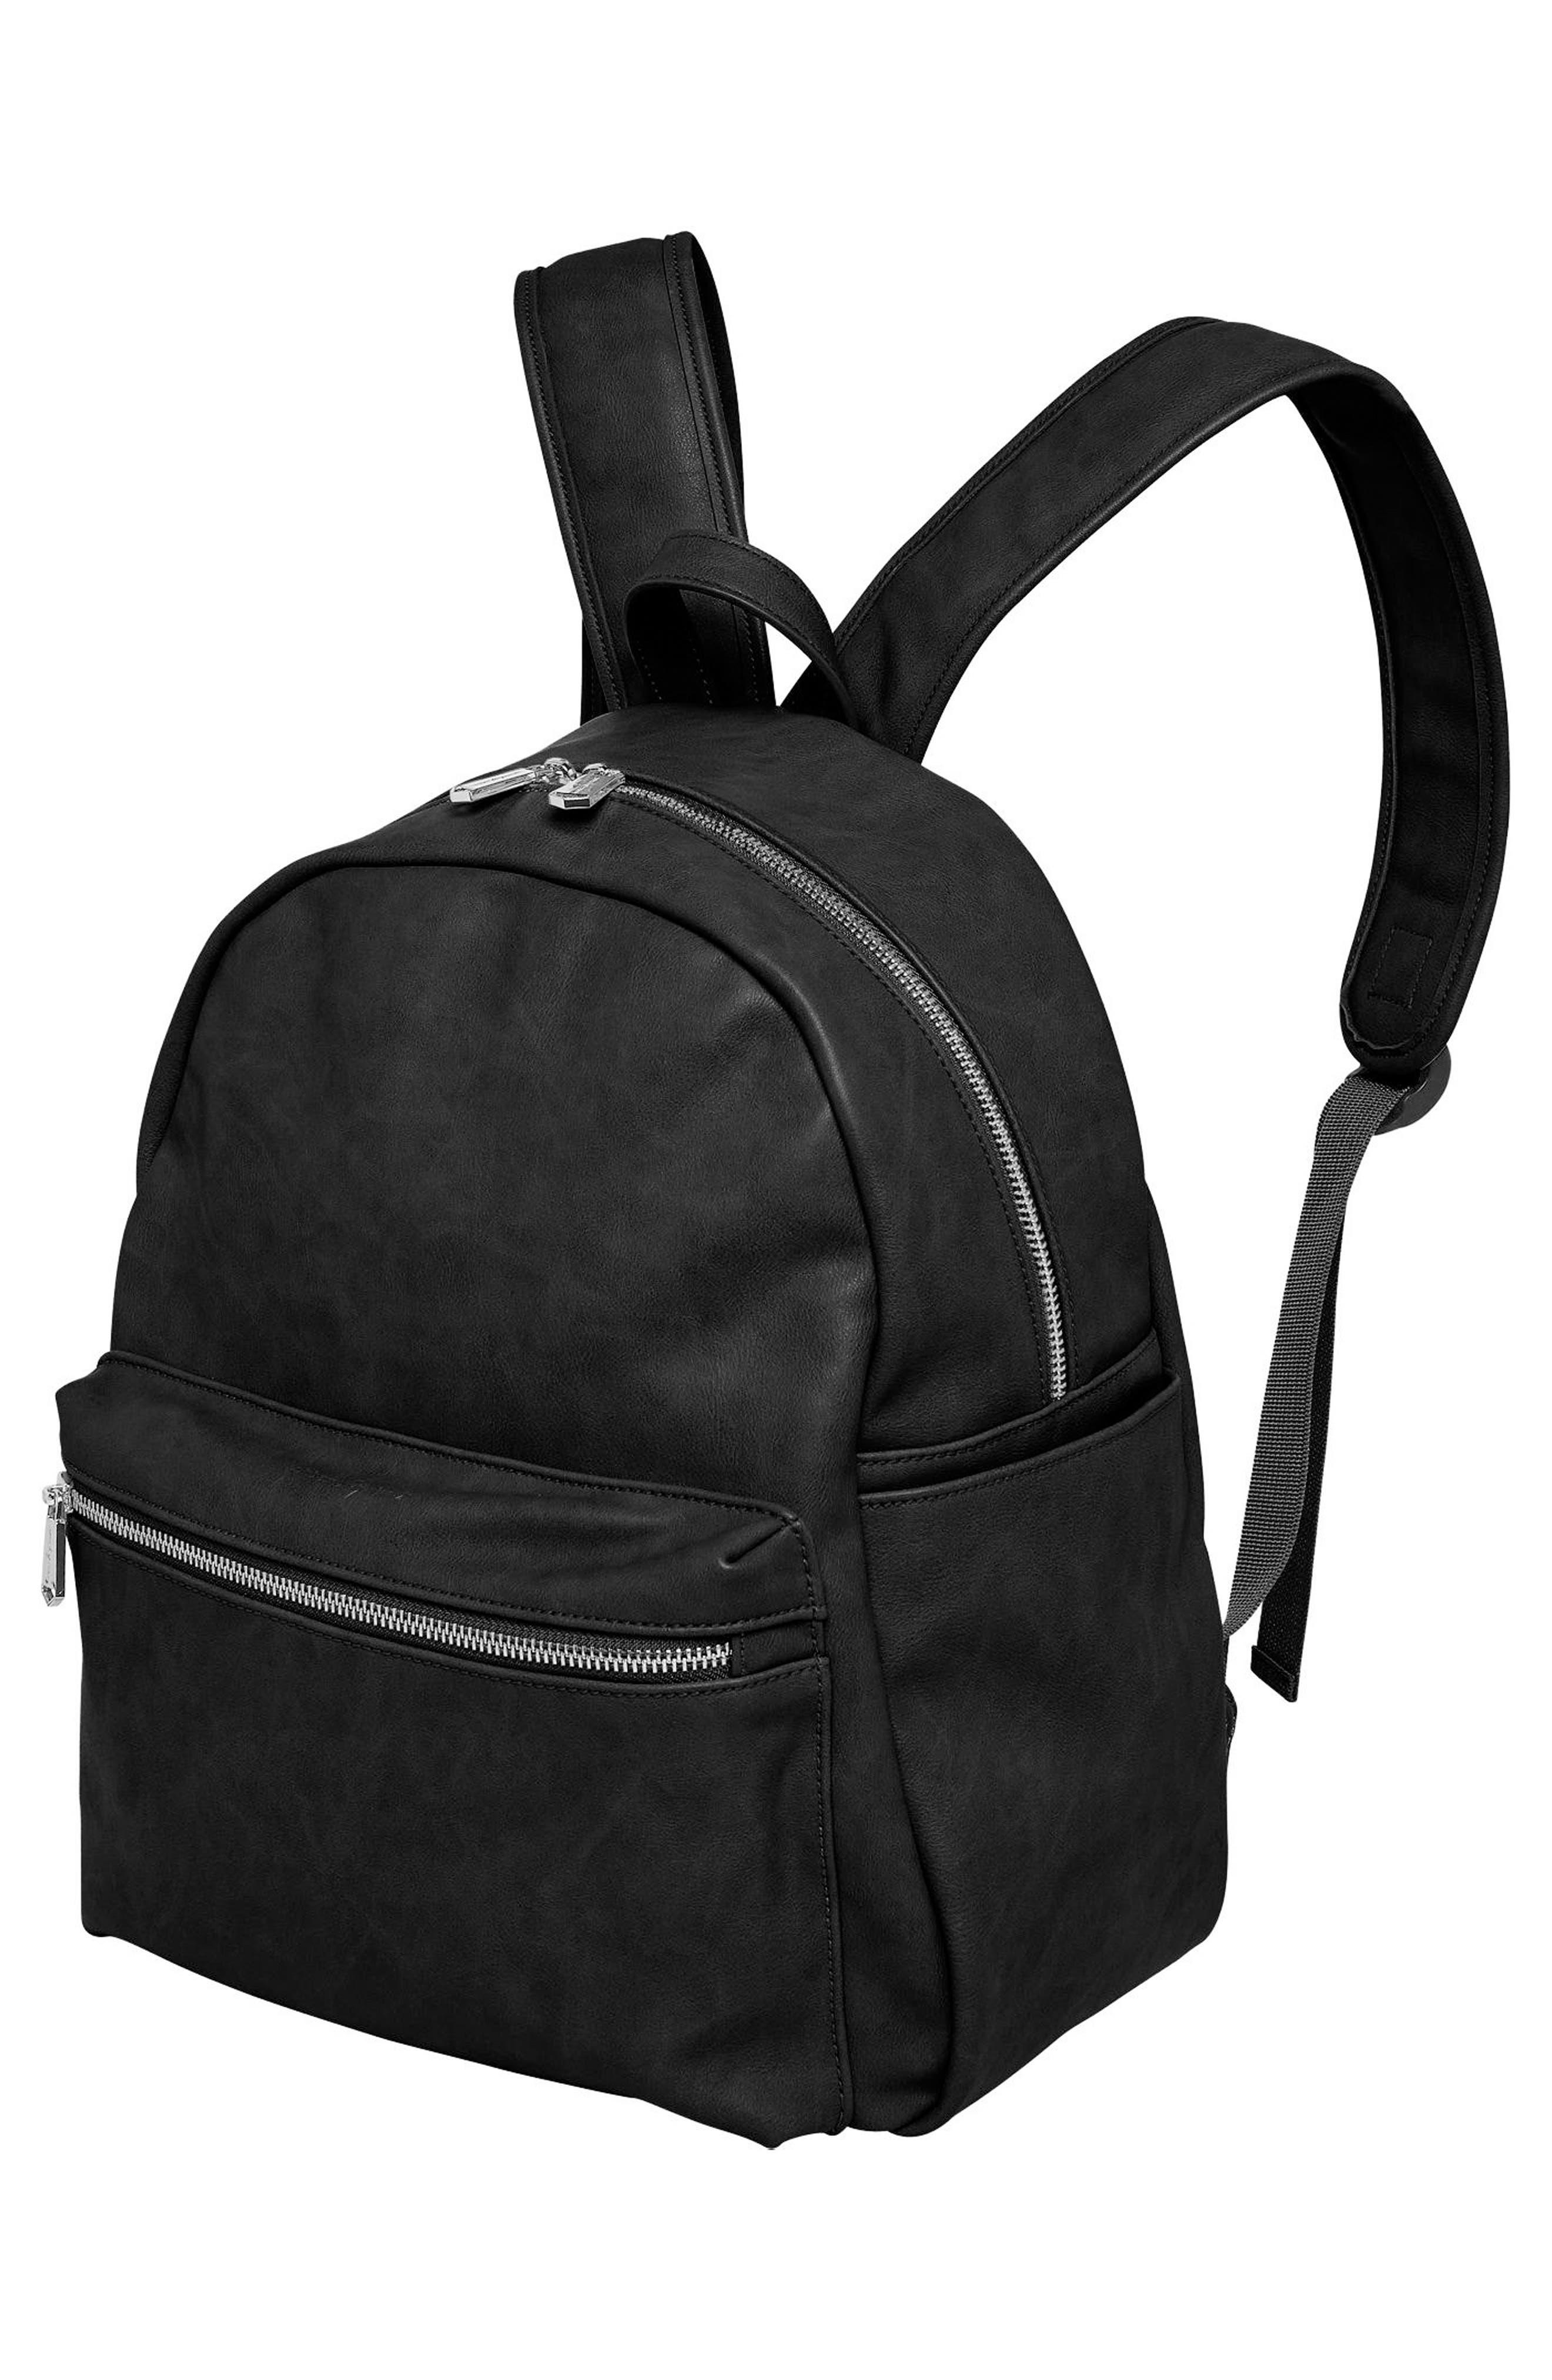 Practical Vegan Leather Backpack,                             Alternate thumbnail 4, color,                             001